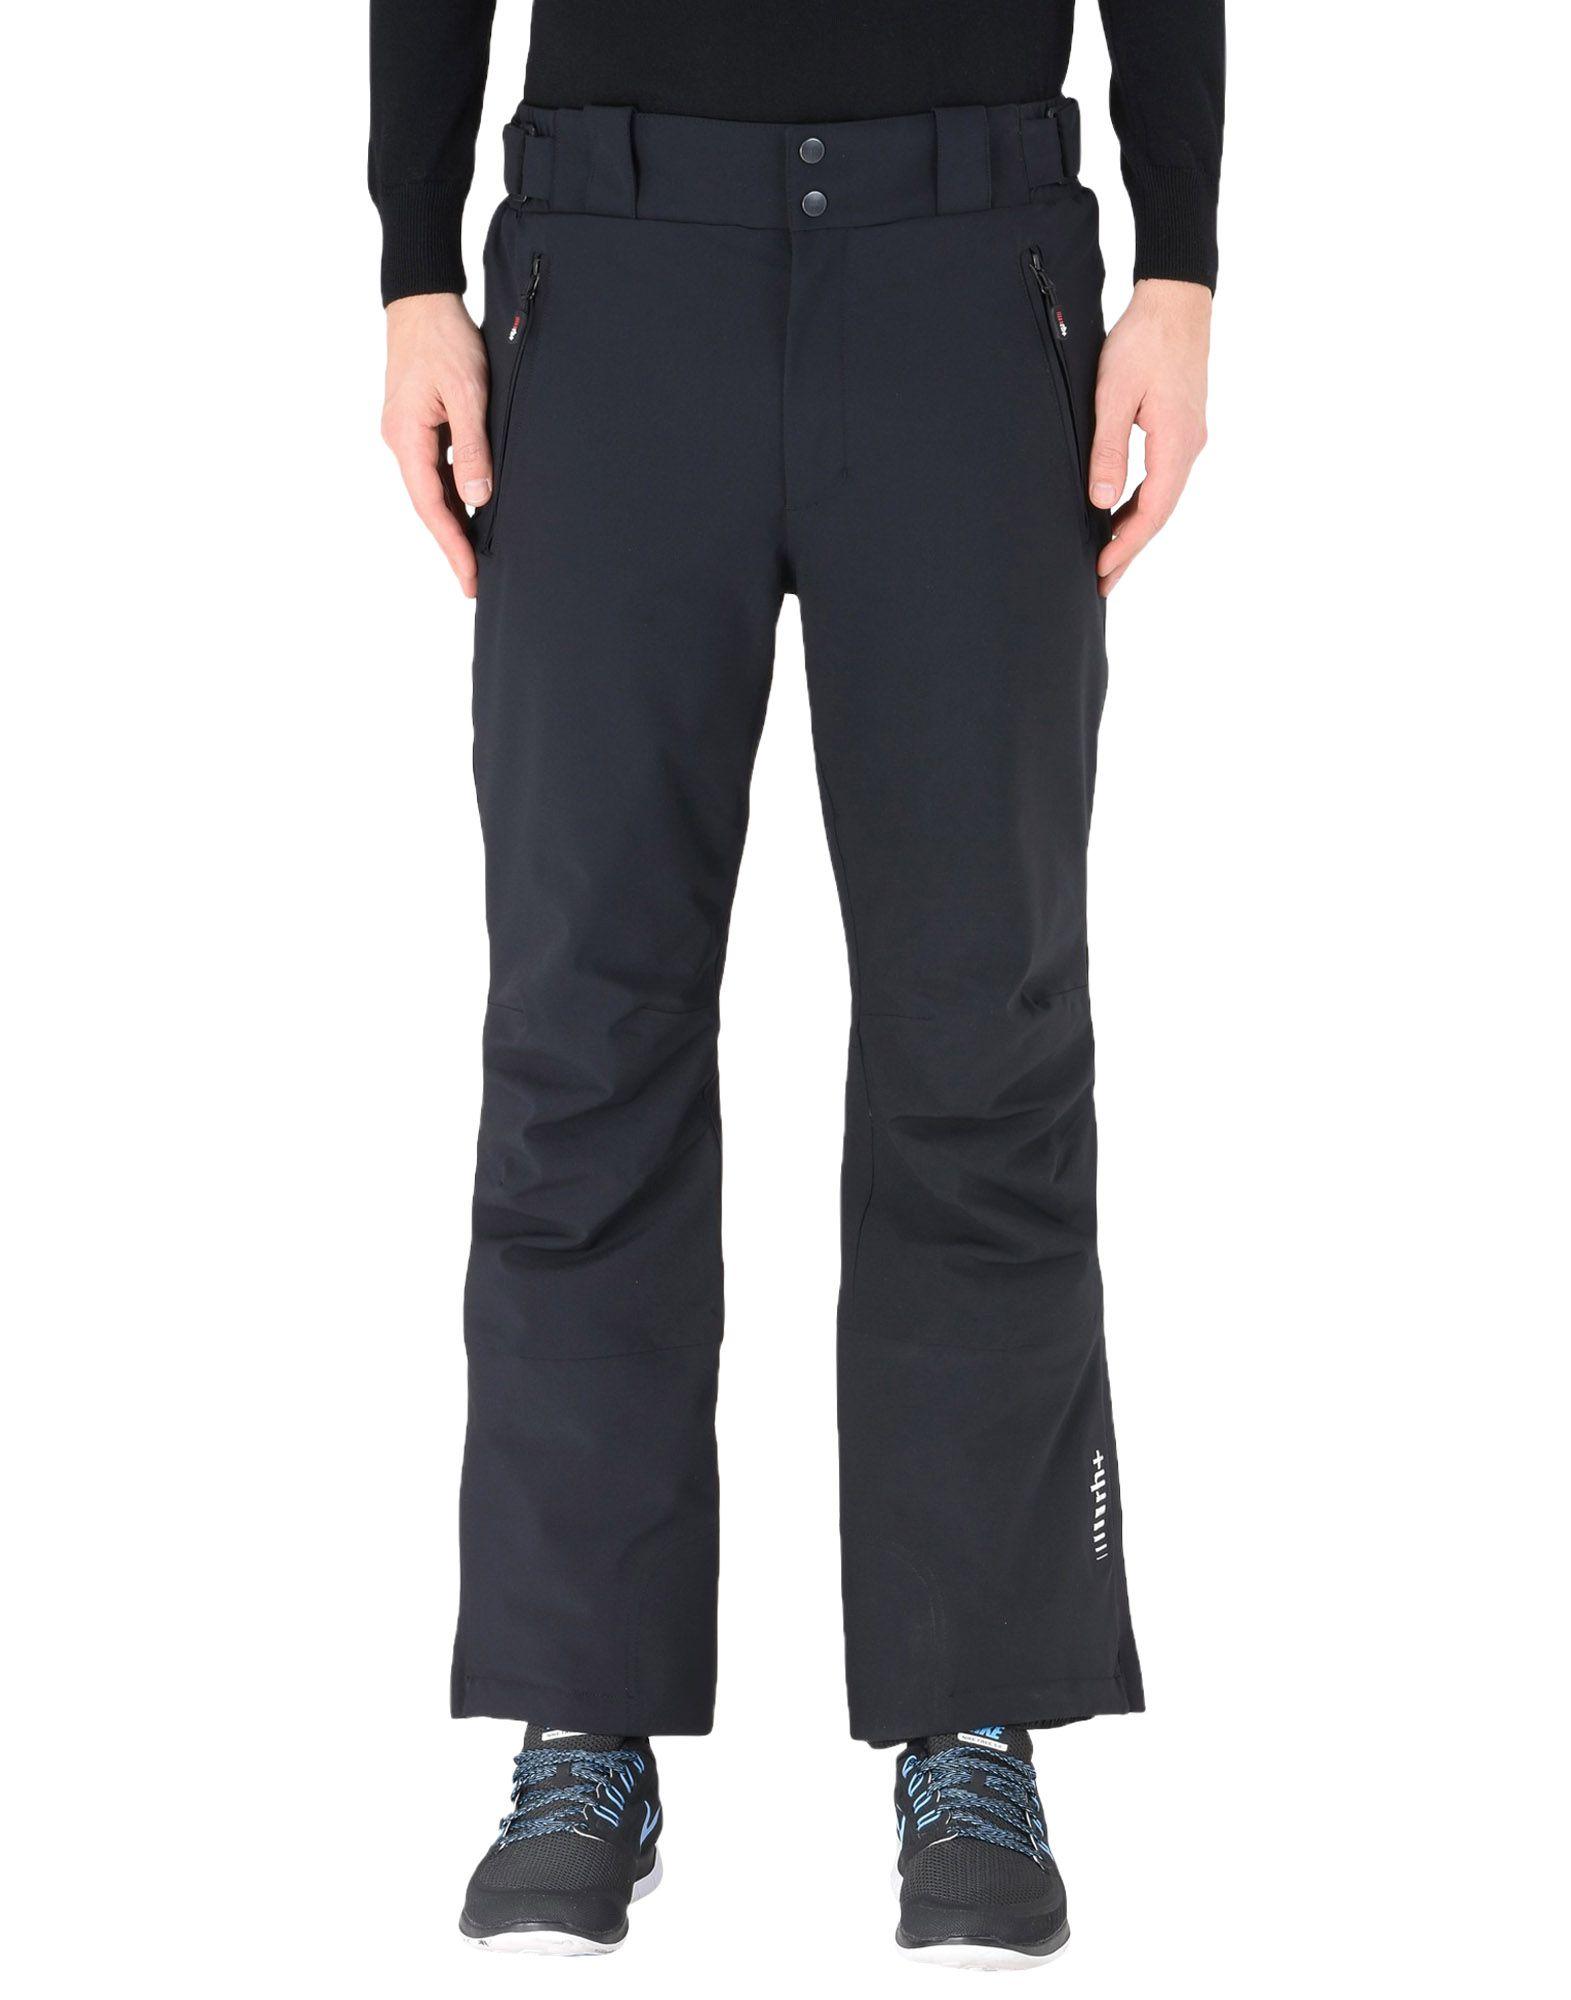 Pantalone Sportivo Rh+ Logic Pants - Uomo - Acquista online su